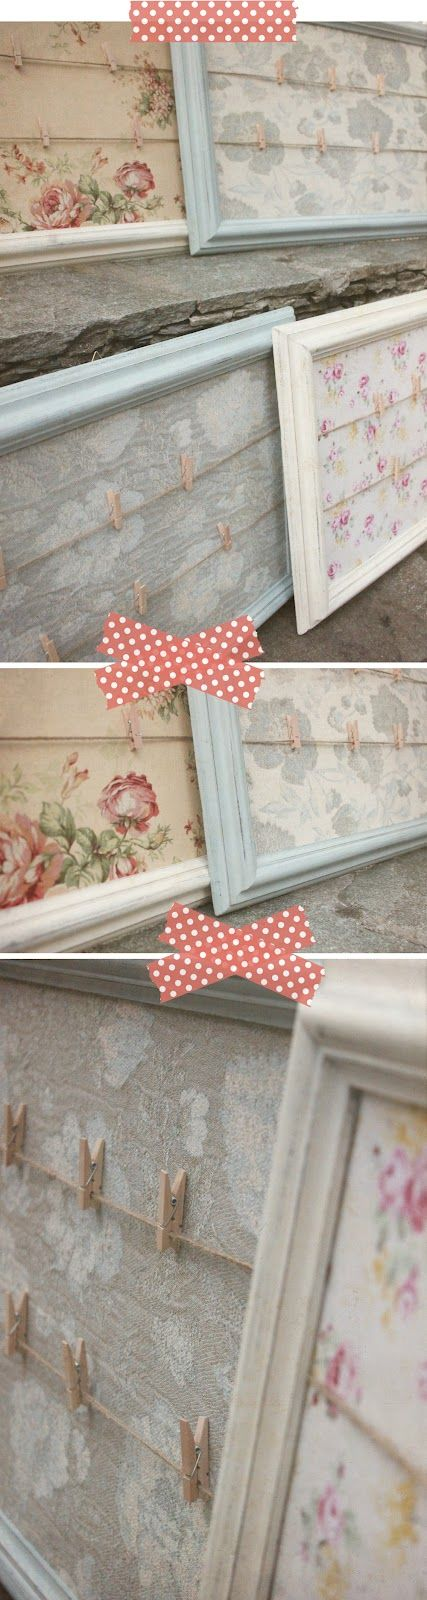 Framed Memo Holder - Shabby Chic Interiors **Great to display handmade cards**